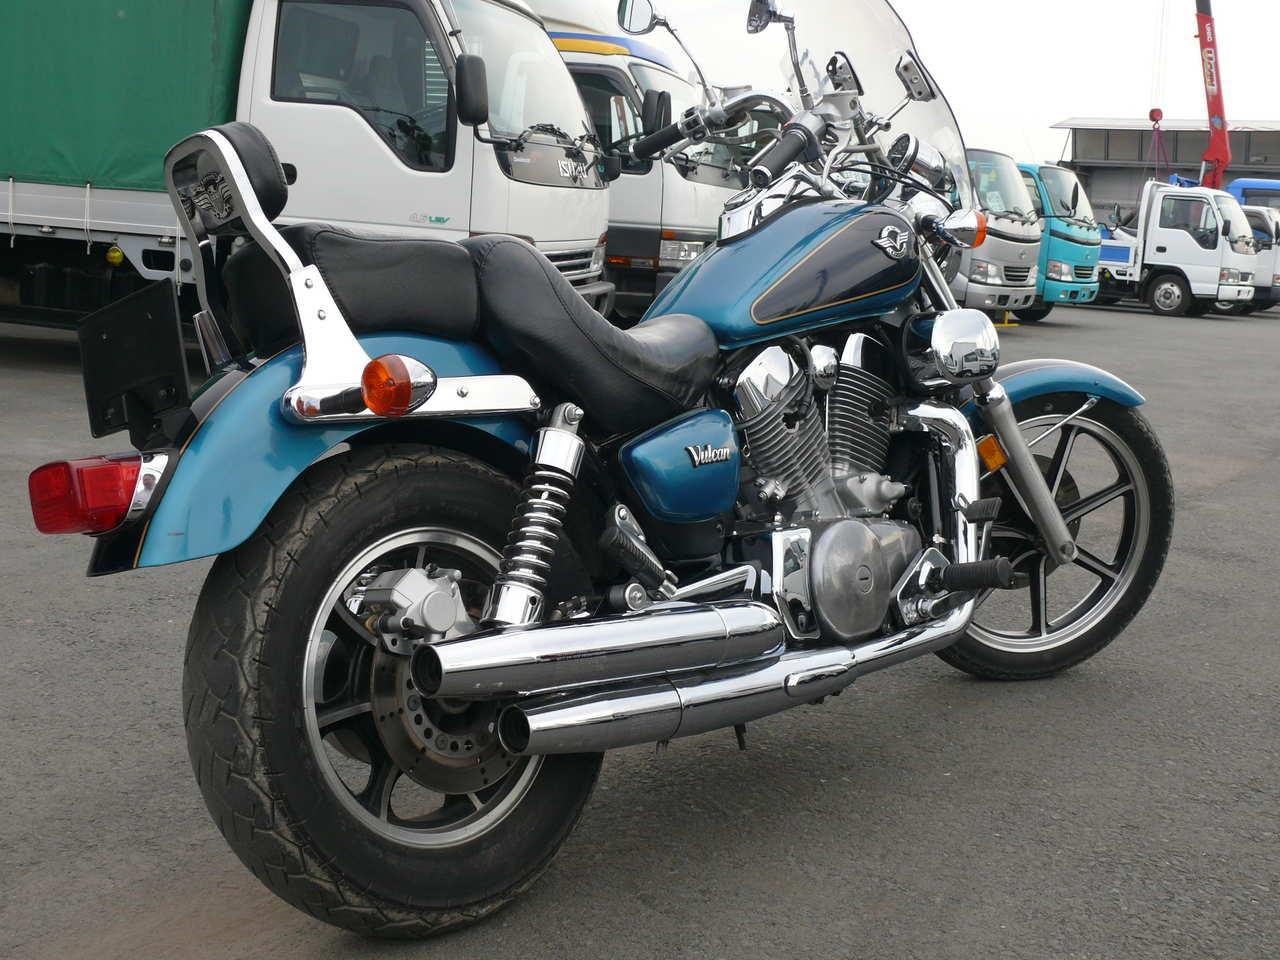 Used 1994 Kawasaki Vulcan 1500 Clic Photos, 1500cc. For Sale